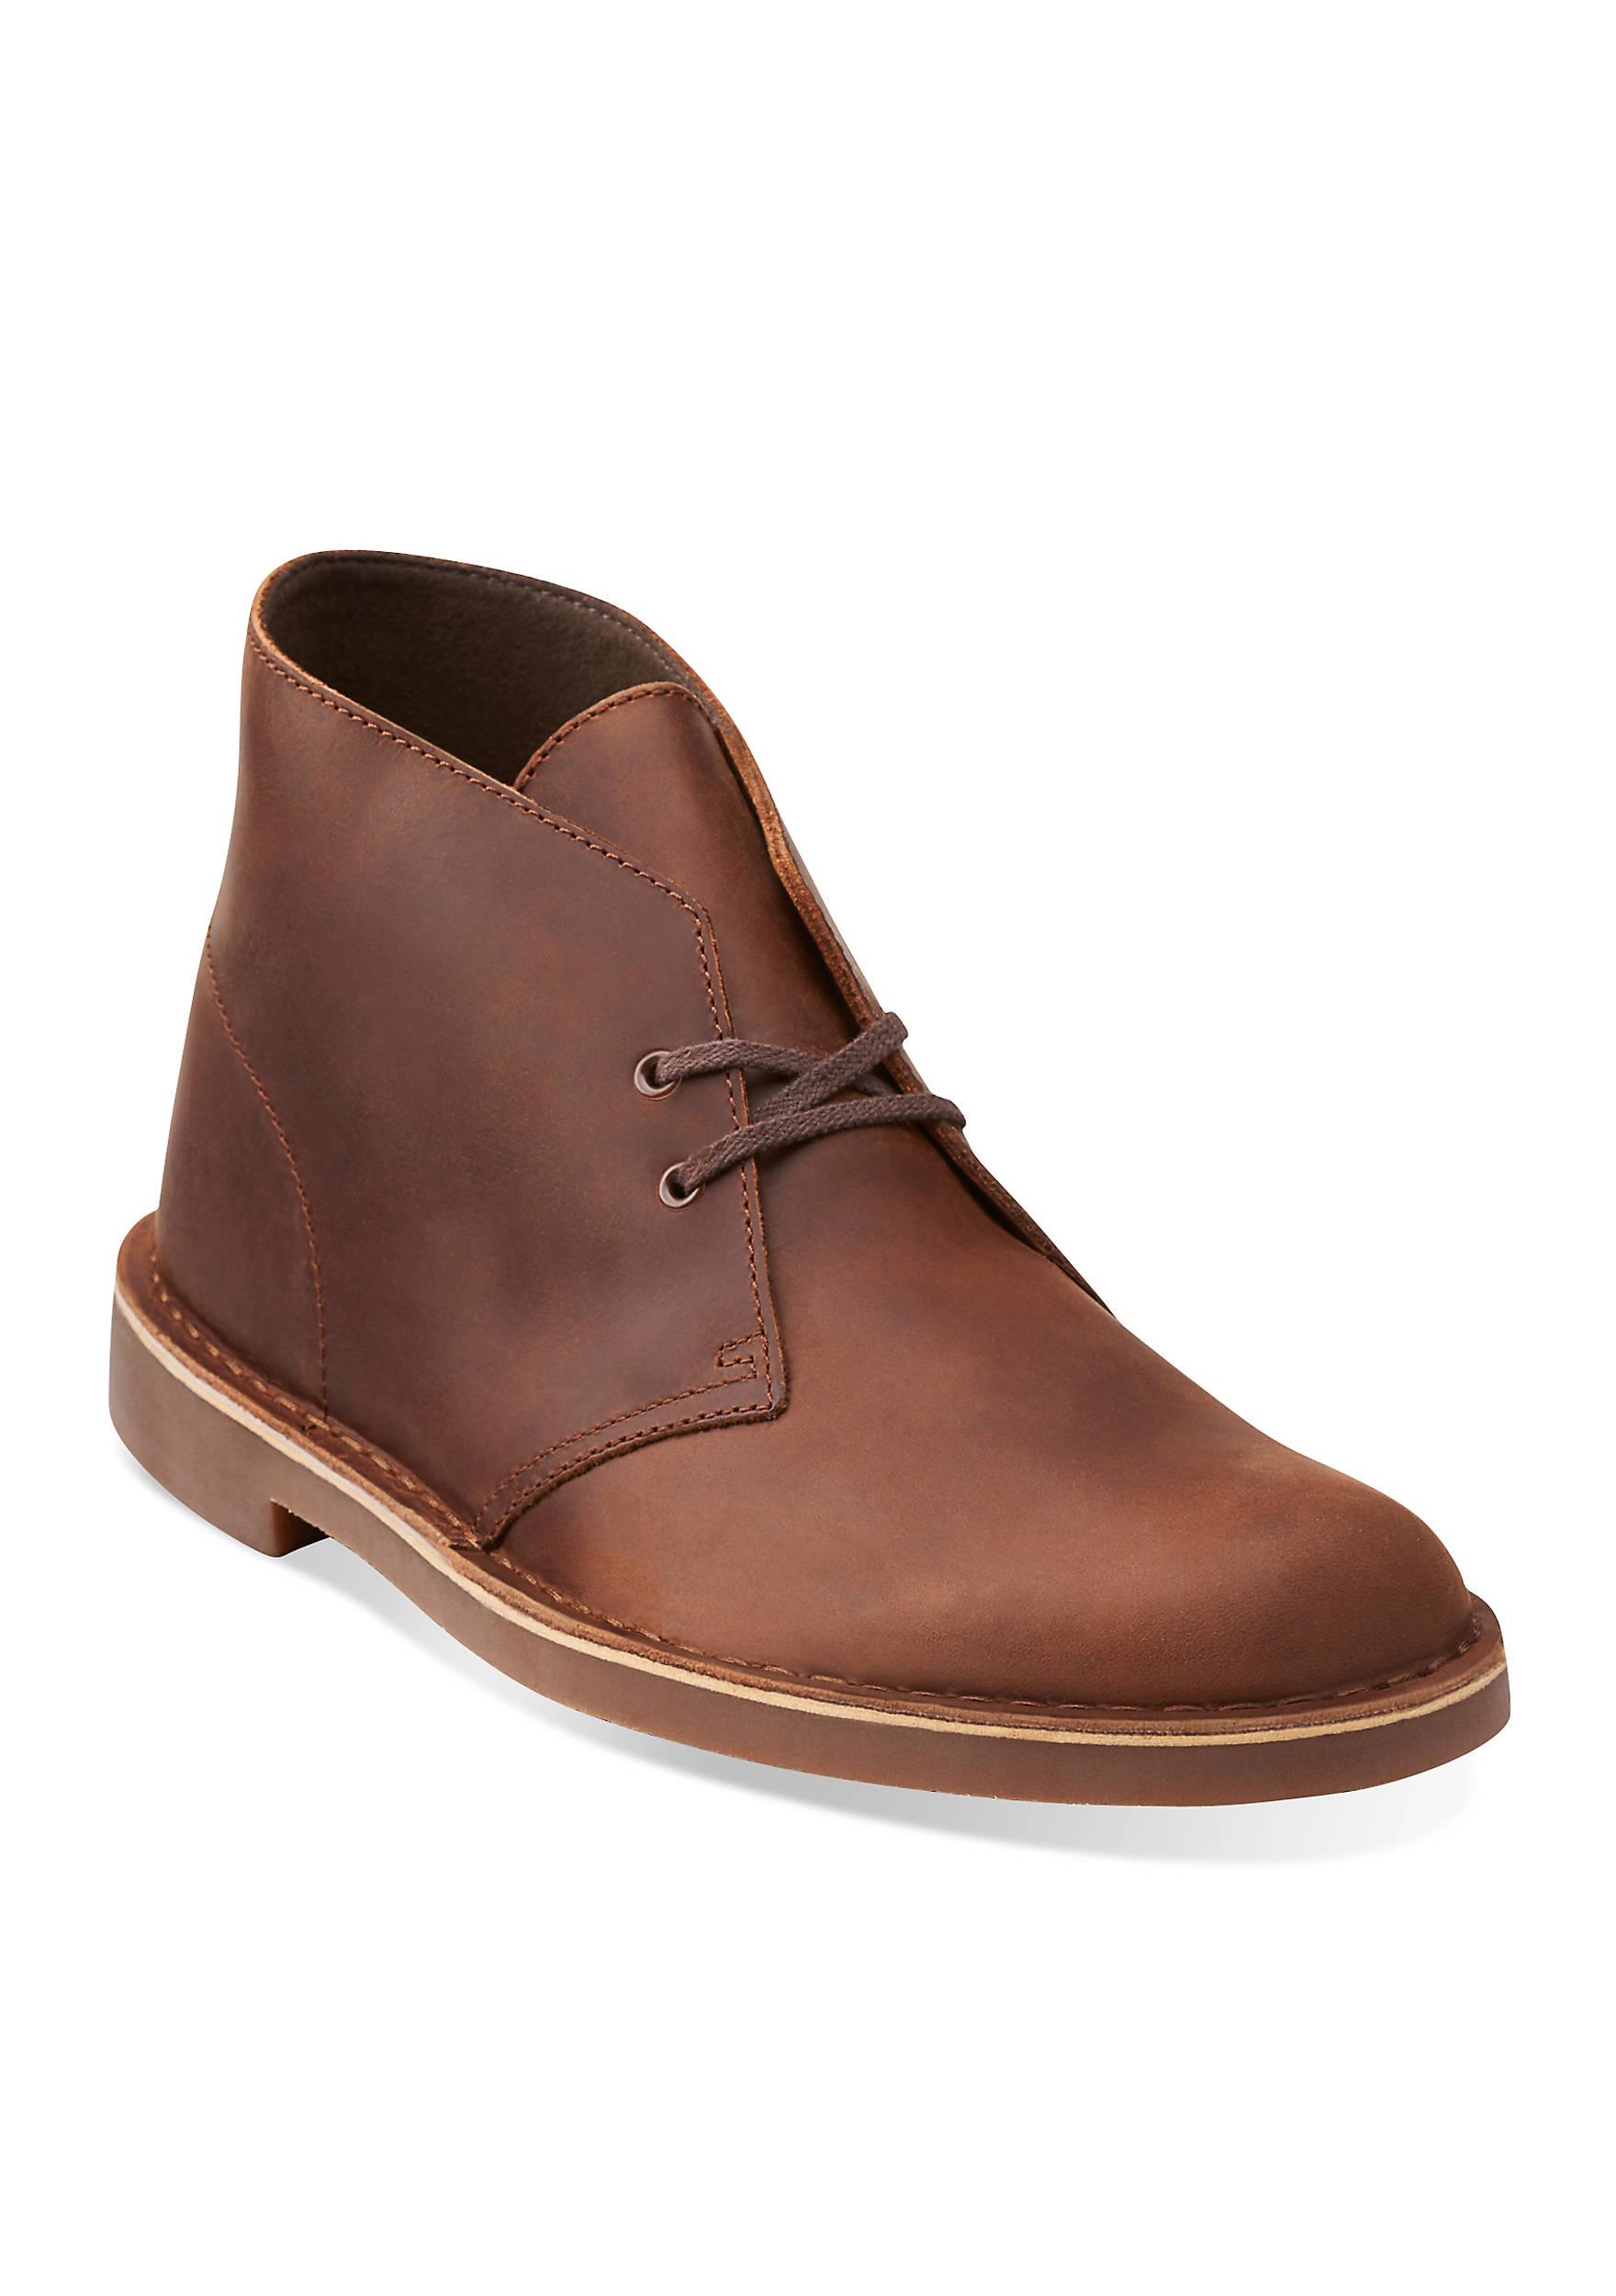 Mens Narrow Width Golf Shoes